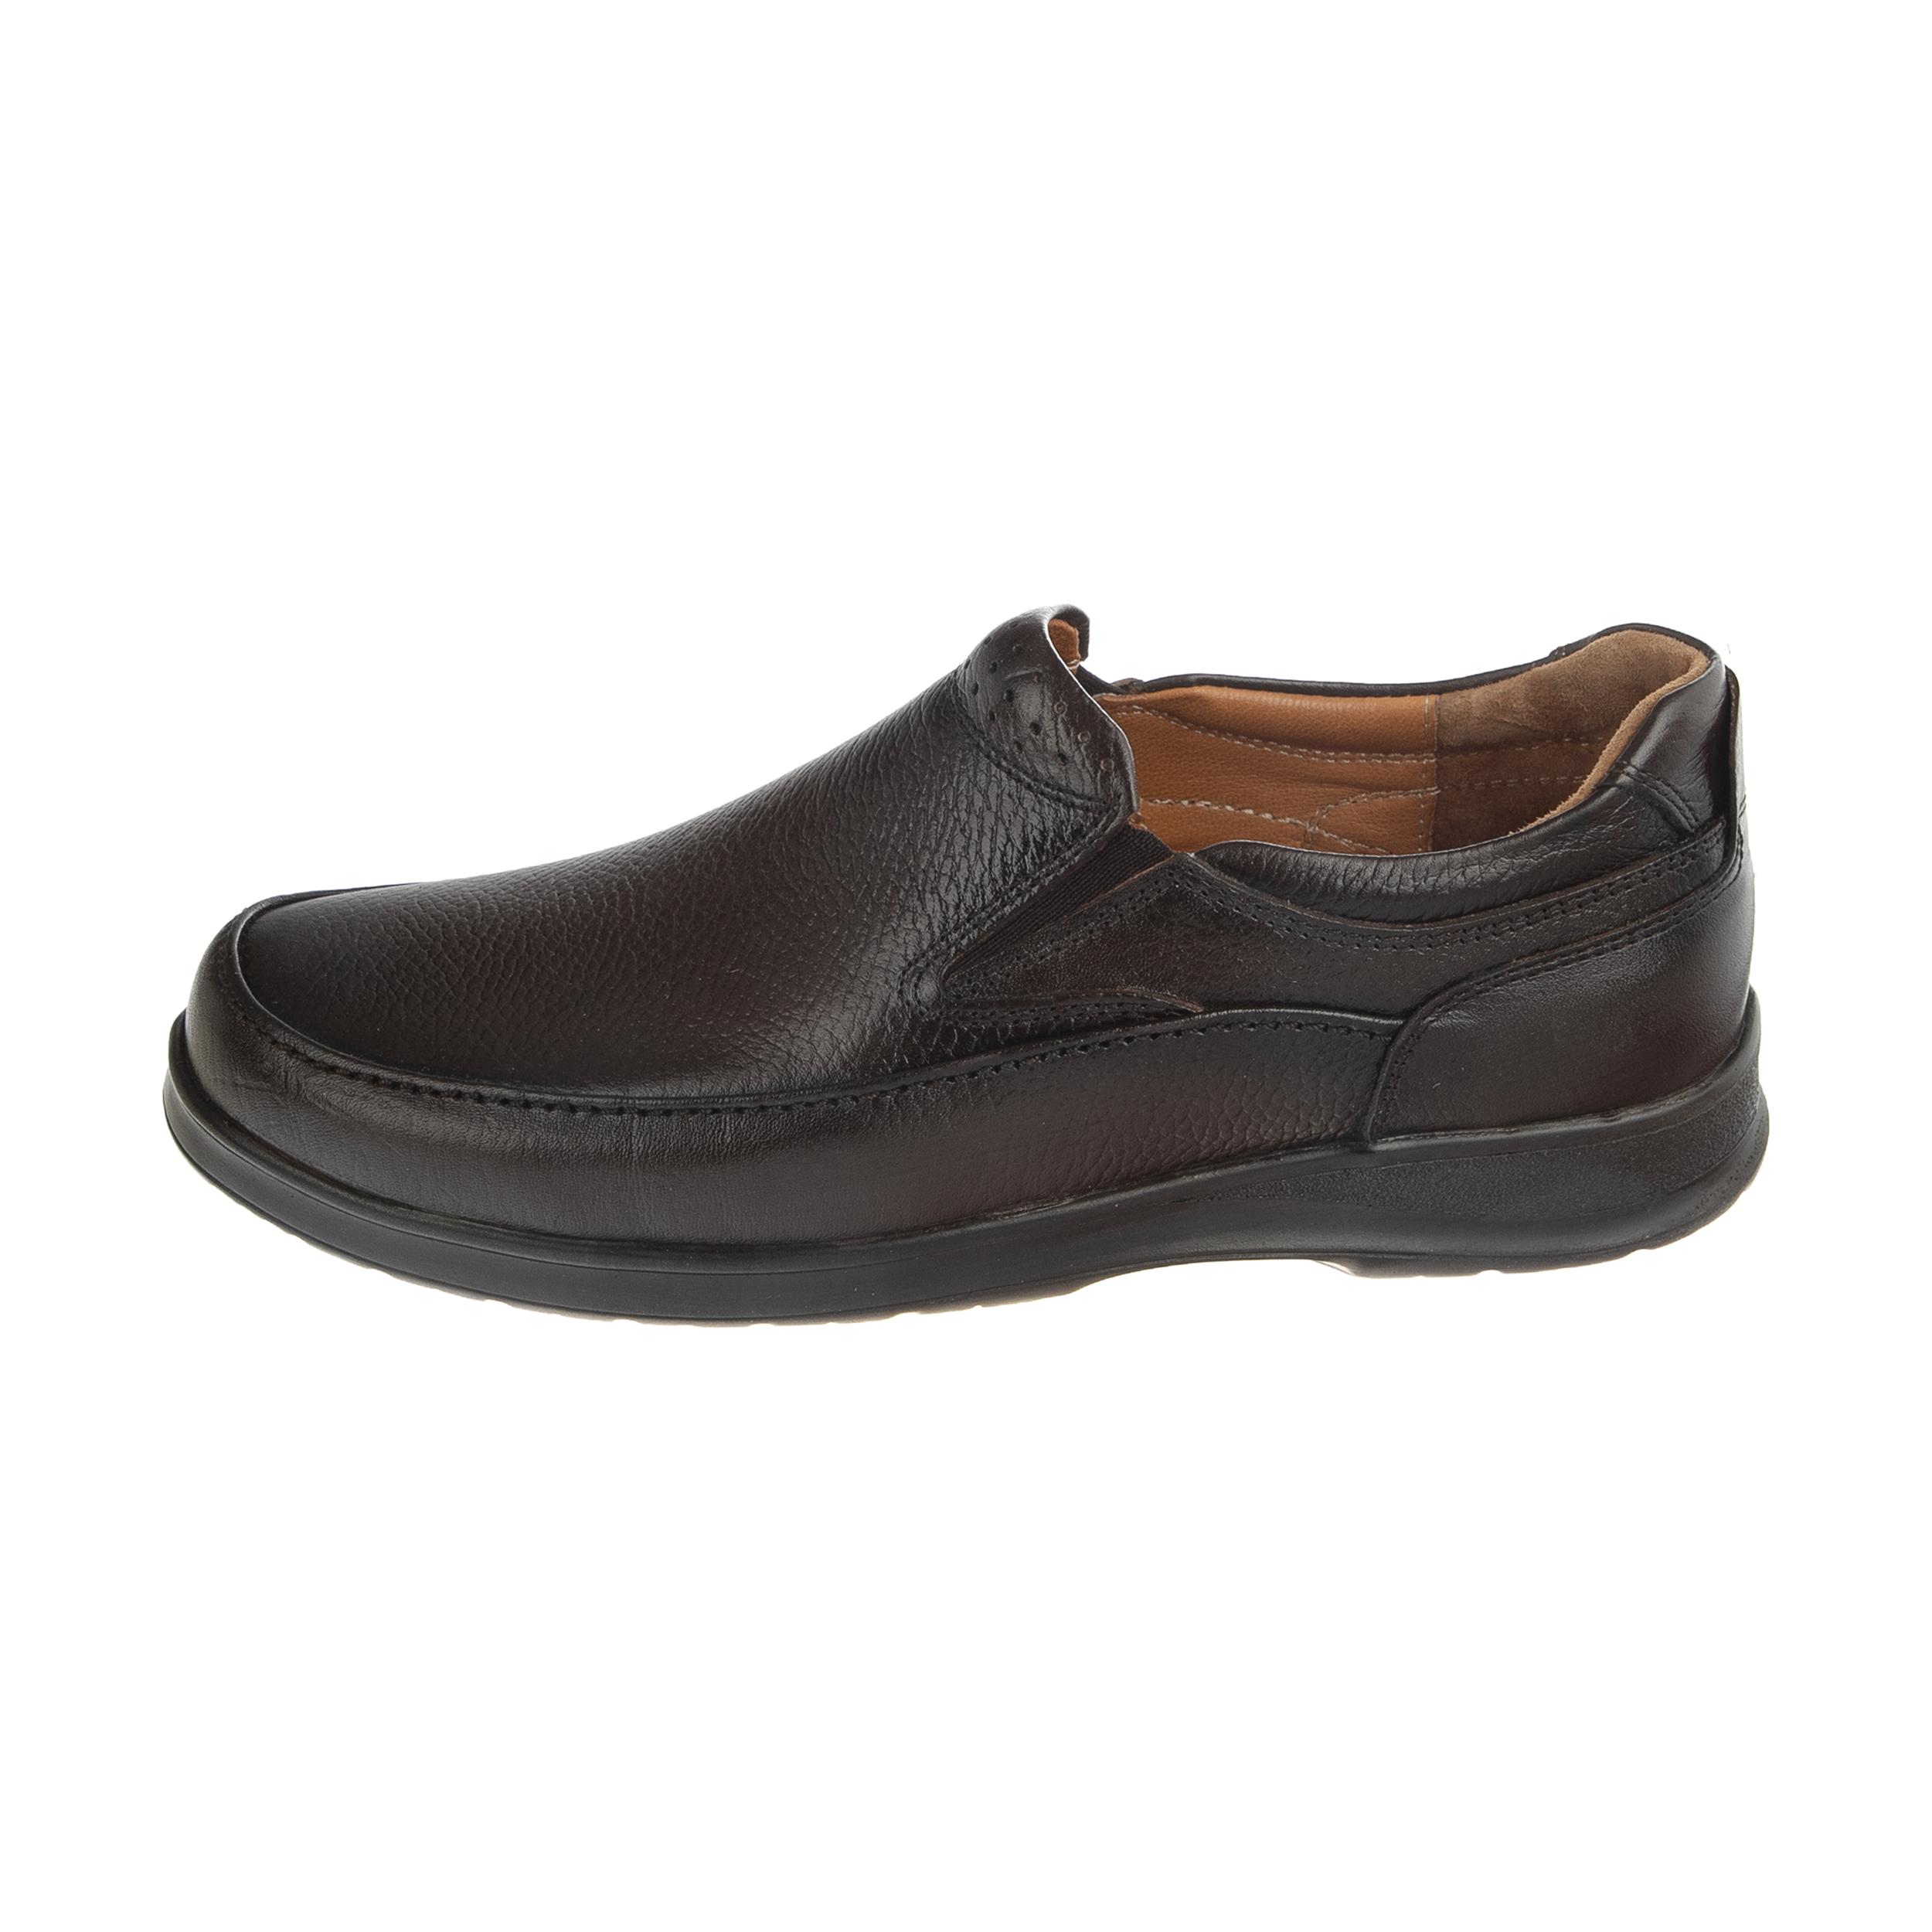 کفش روزمره مردانه مایان مدل 7301A503104